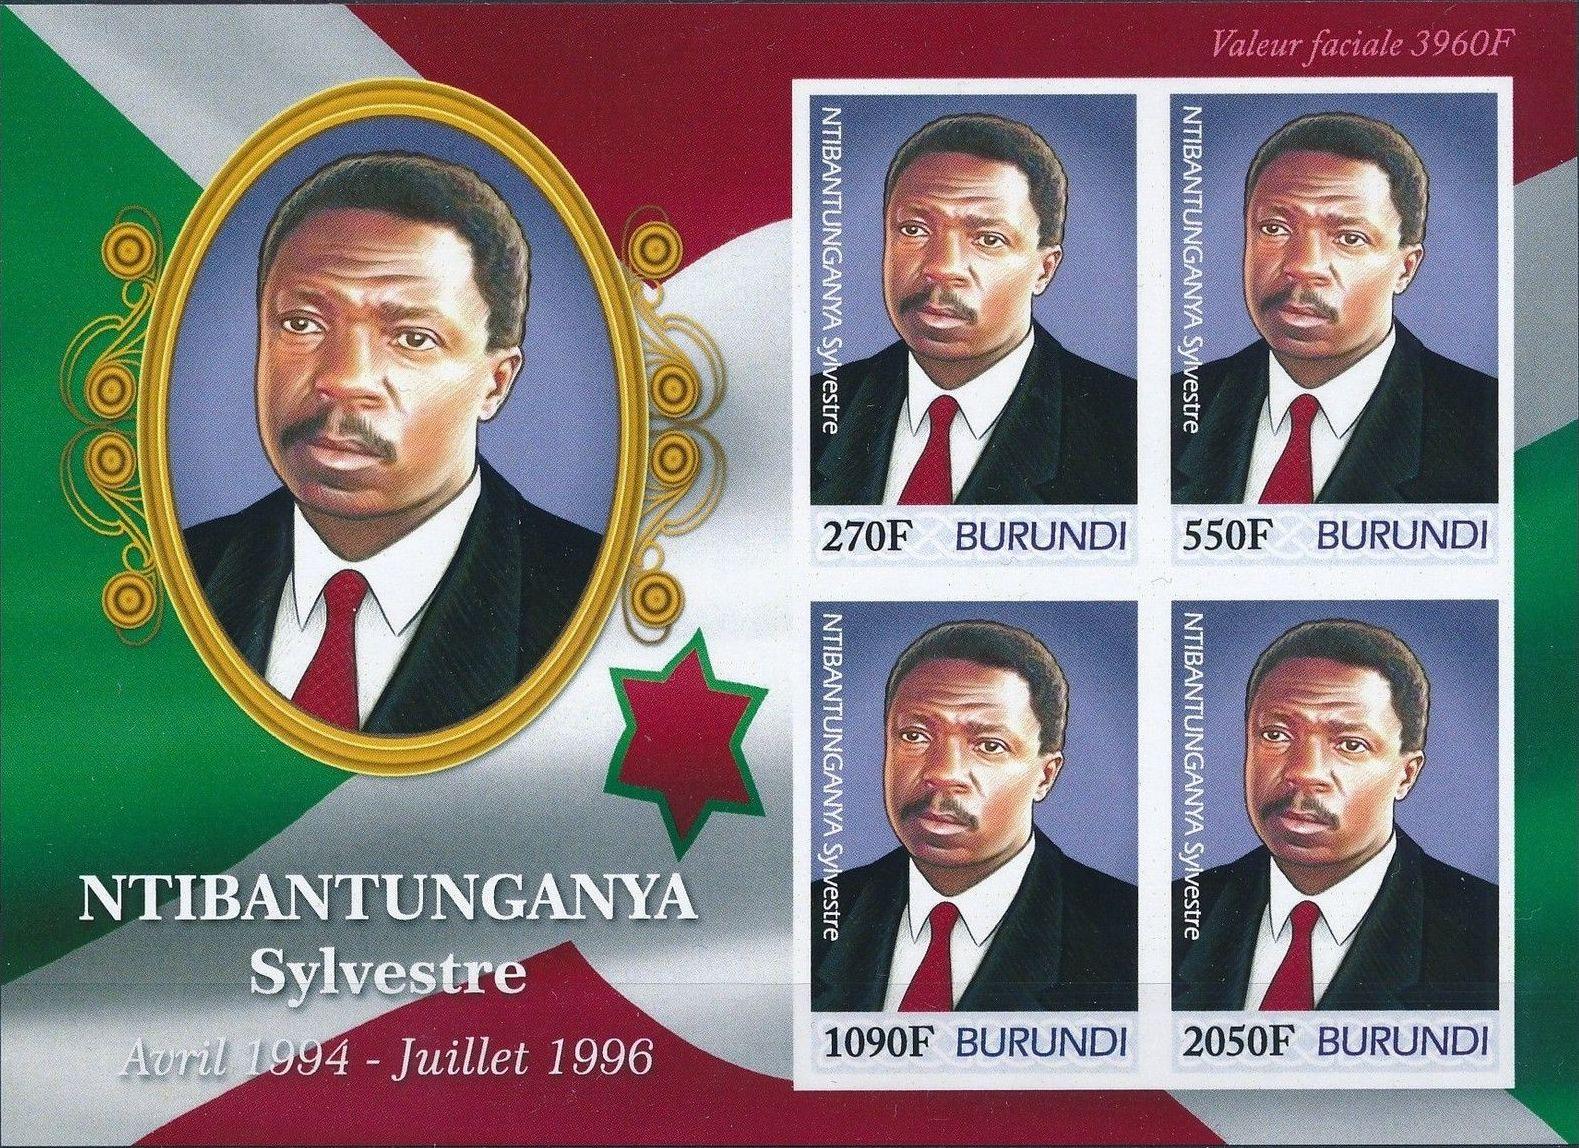 Burundi 2012 Presidents of Burundi - Sylvestre Ntibantunganya h.jpg